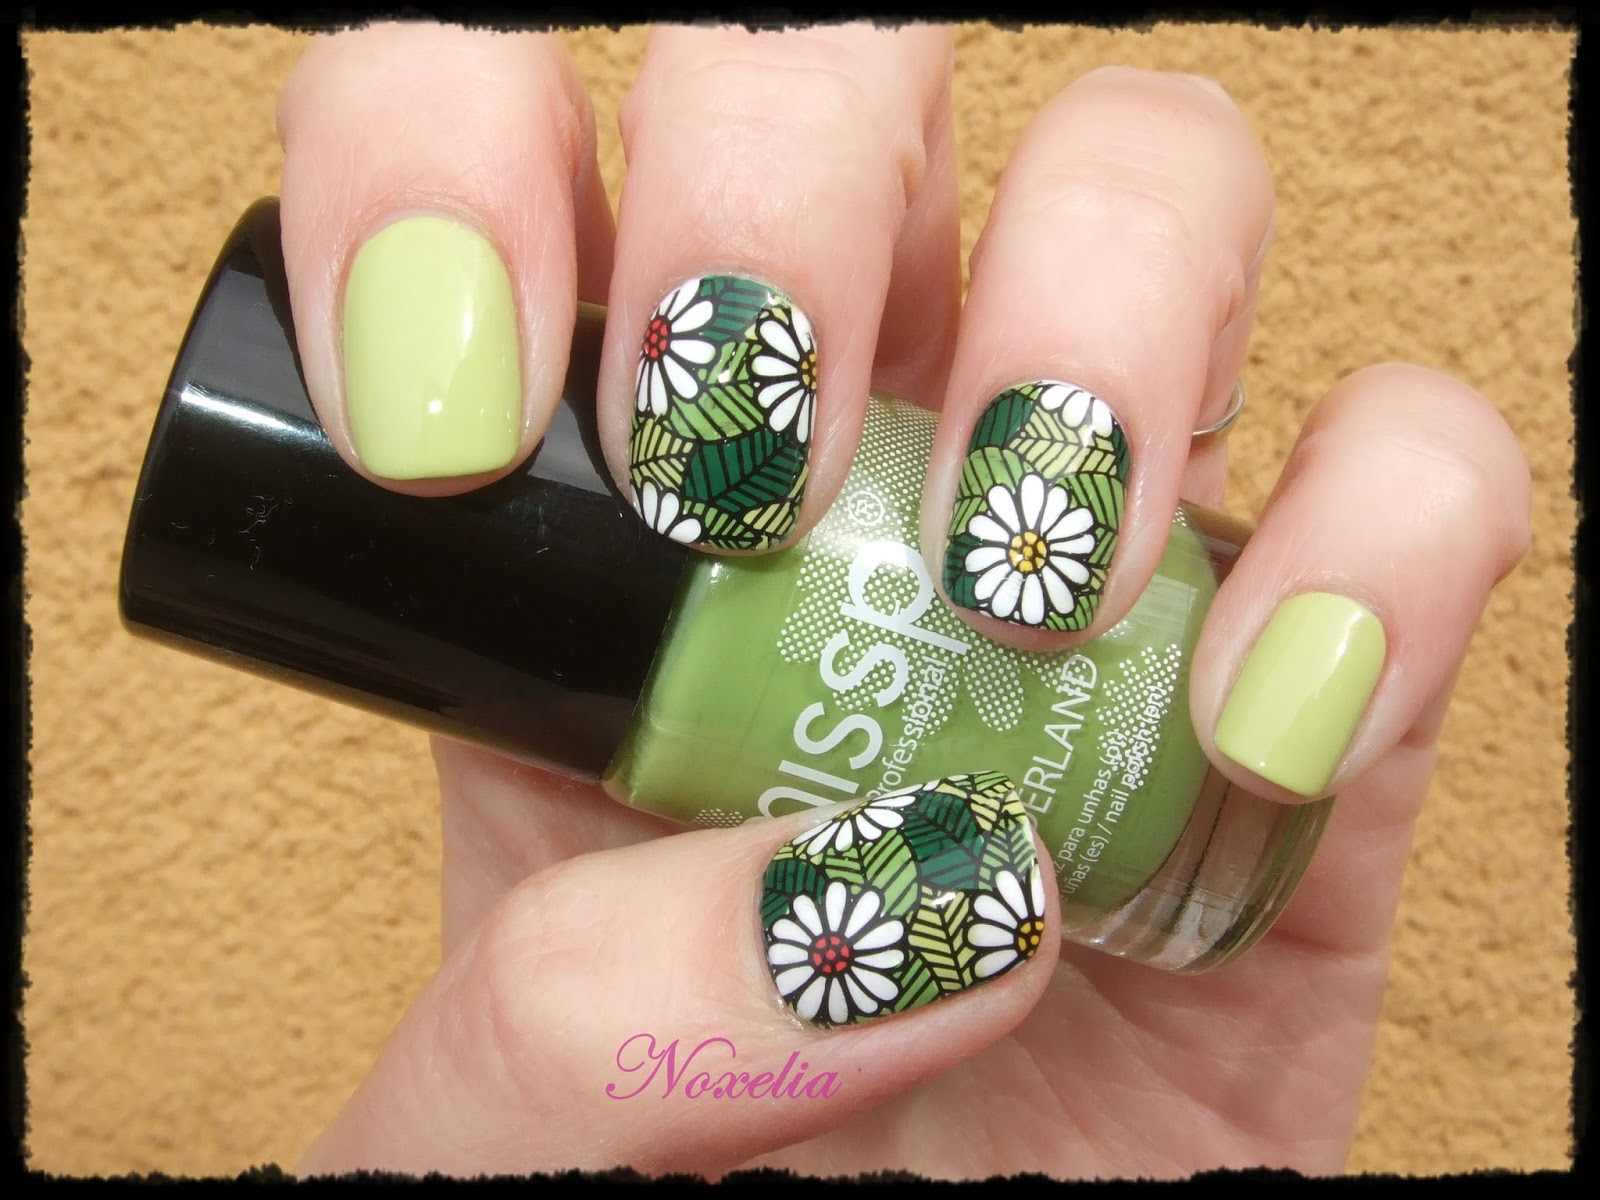 Noxelia: Stamping nail art: Beauty BigBang. Look de uñas Nº 425